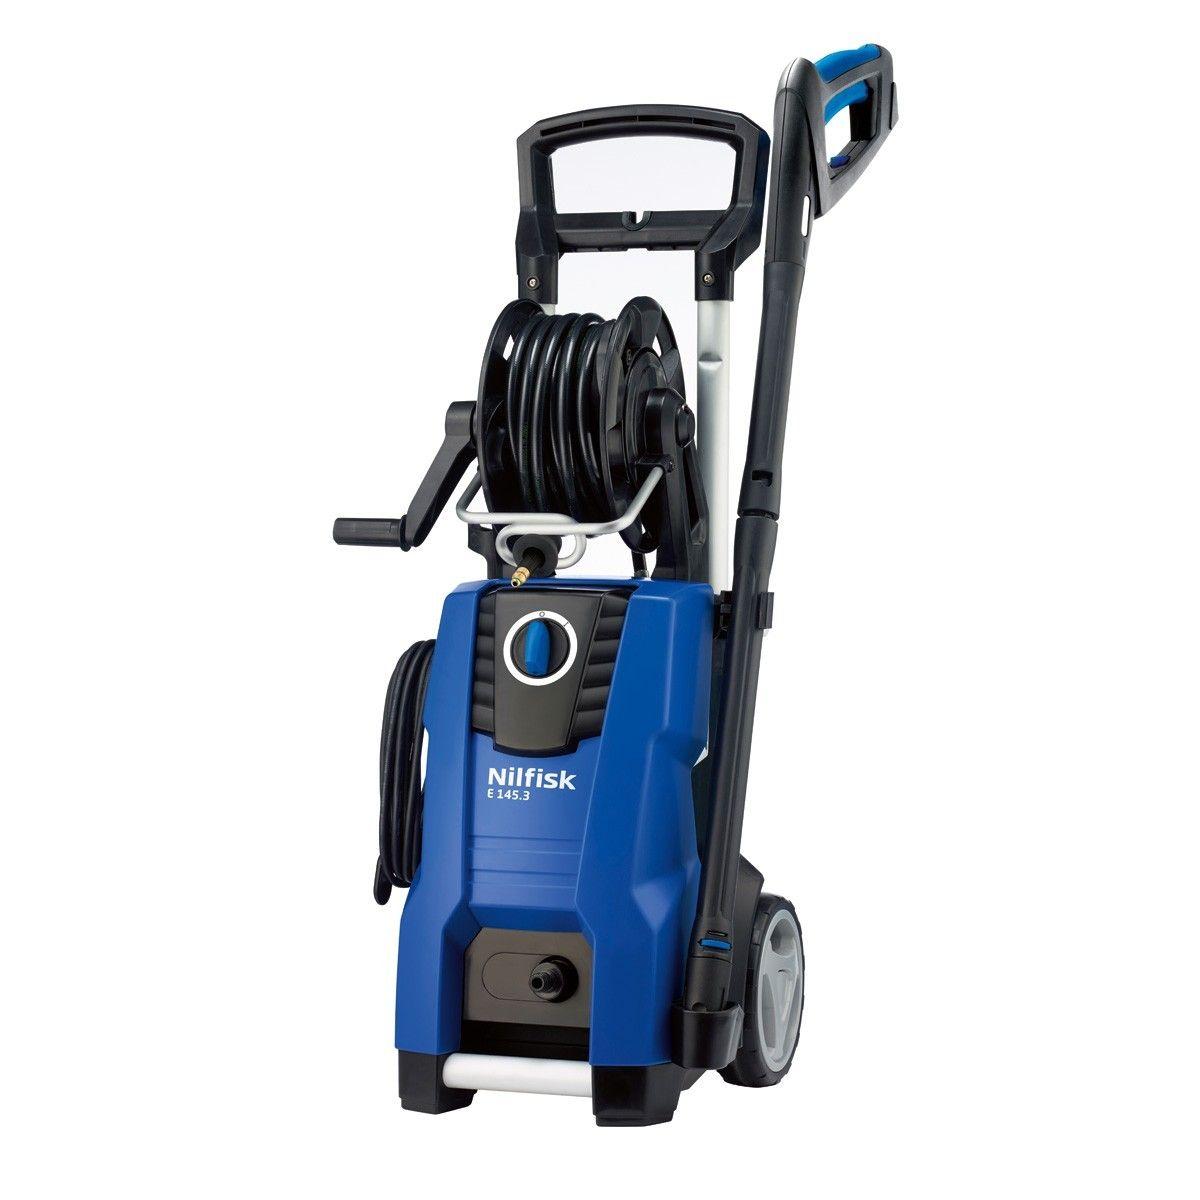 Nilfisk-Painepesuri E 145.3-10 Xtra, Patio Cleaner kaupan päälle!-2